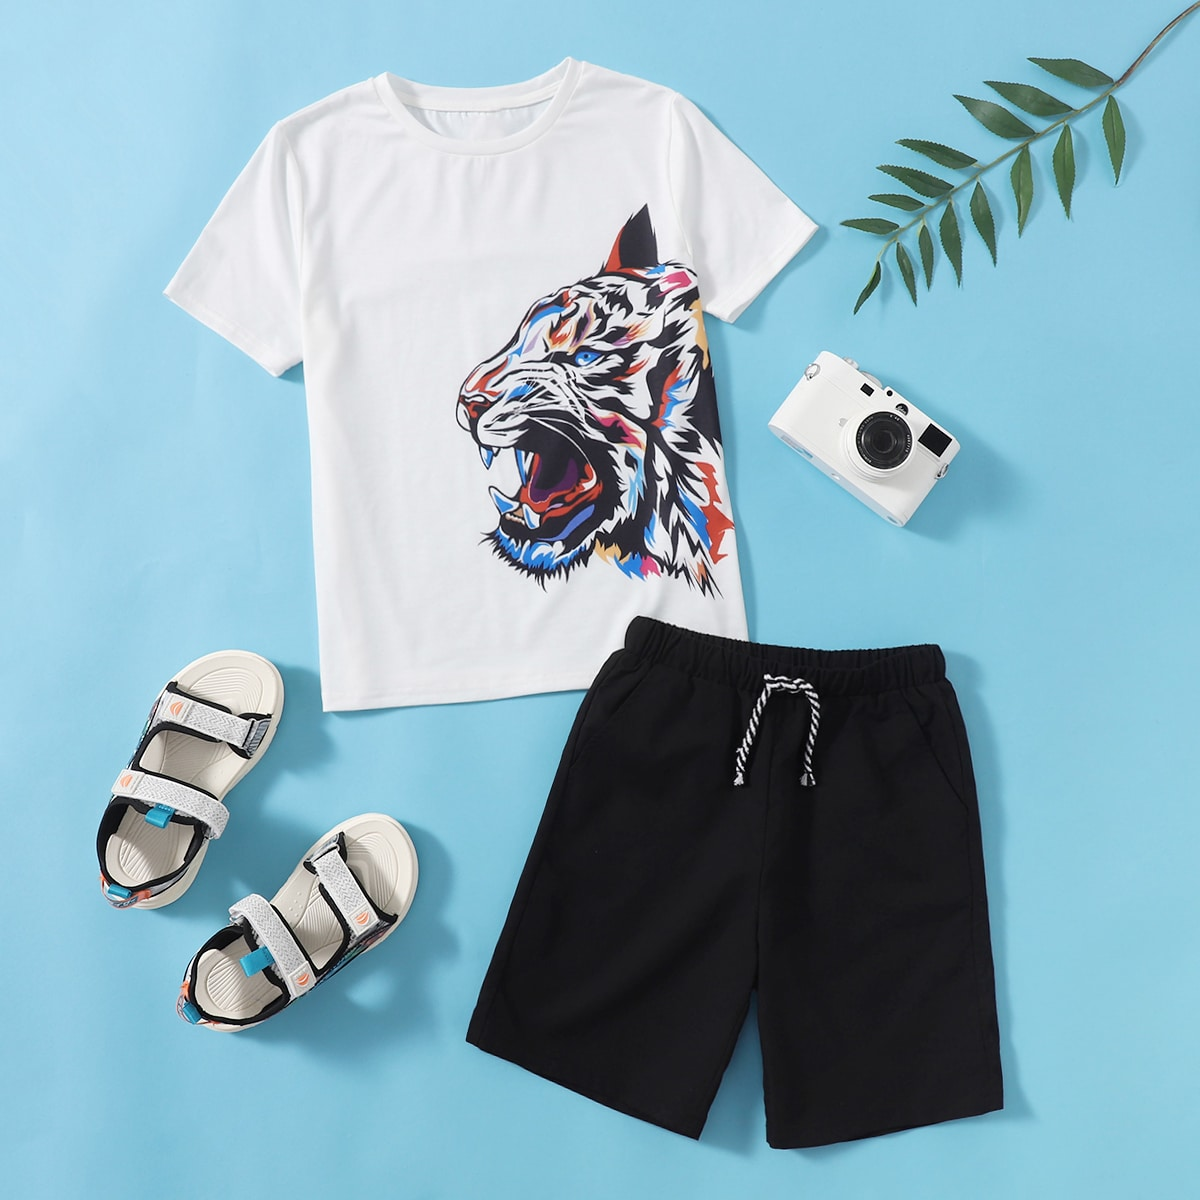 Boys Tiger Print Tee & Drawstring Track Shorts, SHEIN  - buy with discount